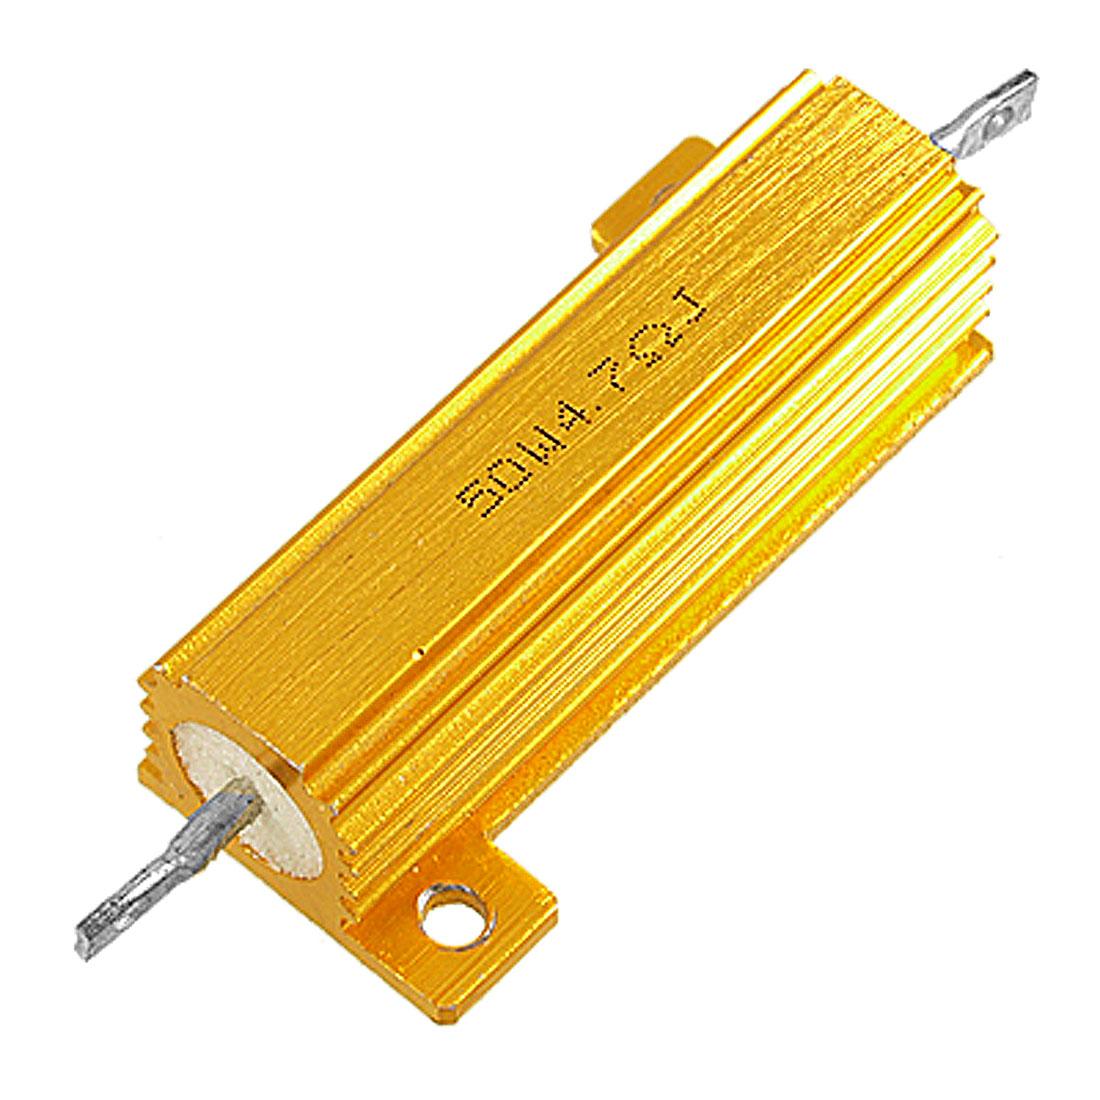 50 Watt 4.7 Ohm 5% Aluminum Housed Wirewound Power Resistor Gold Tone